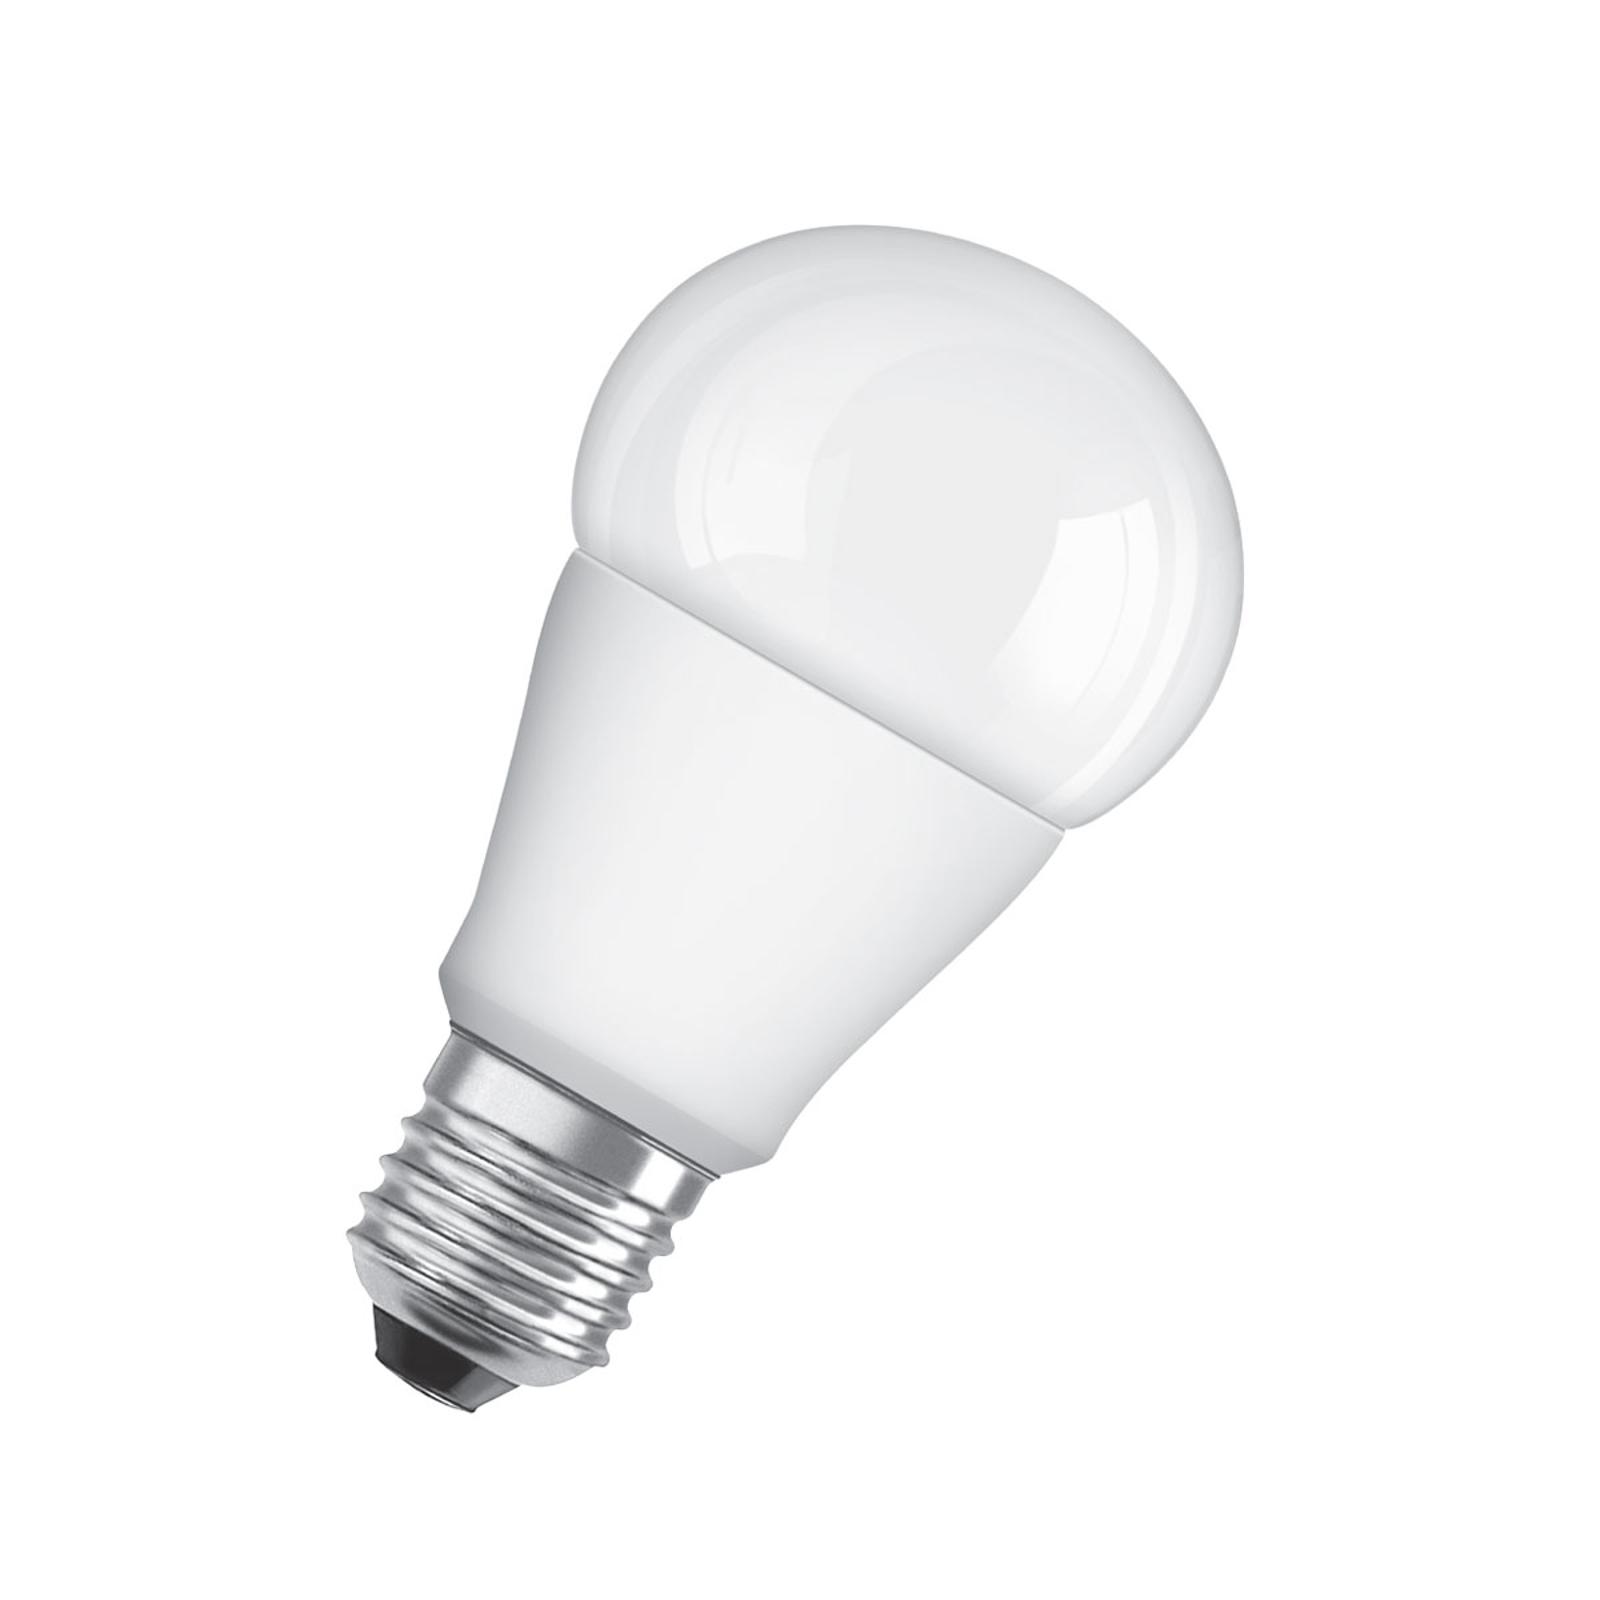 E27 8W 827 LED-lamppu Star, hehkulampun mallinen